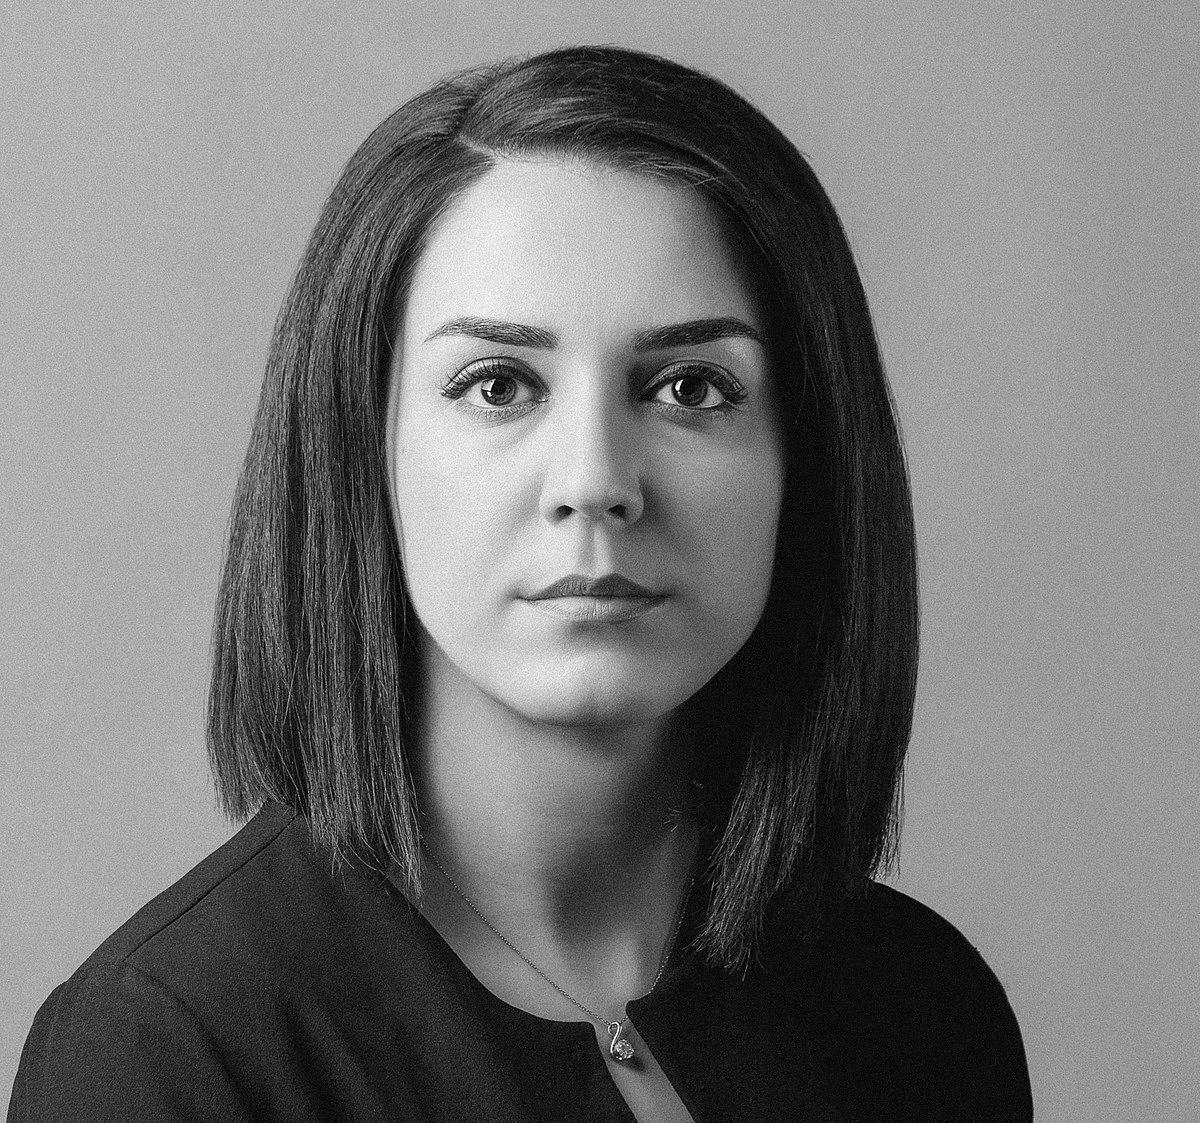 rencontre femme iranienne